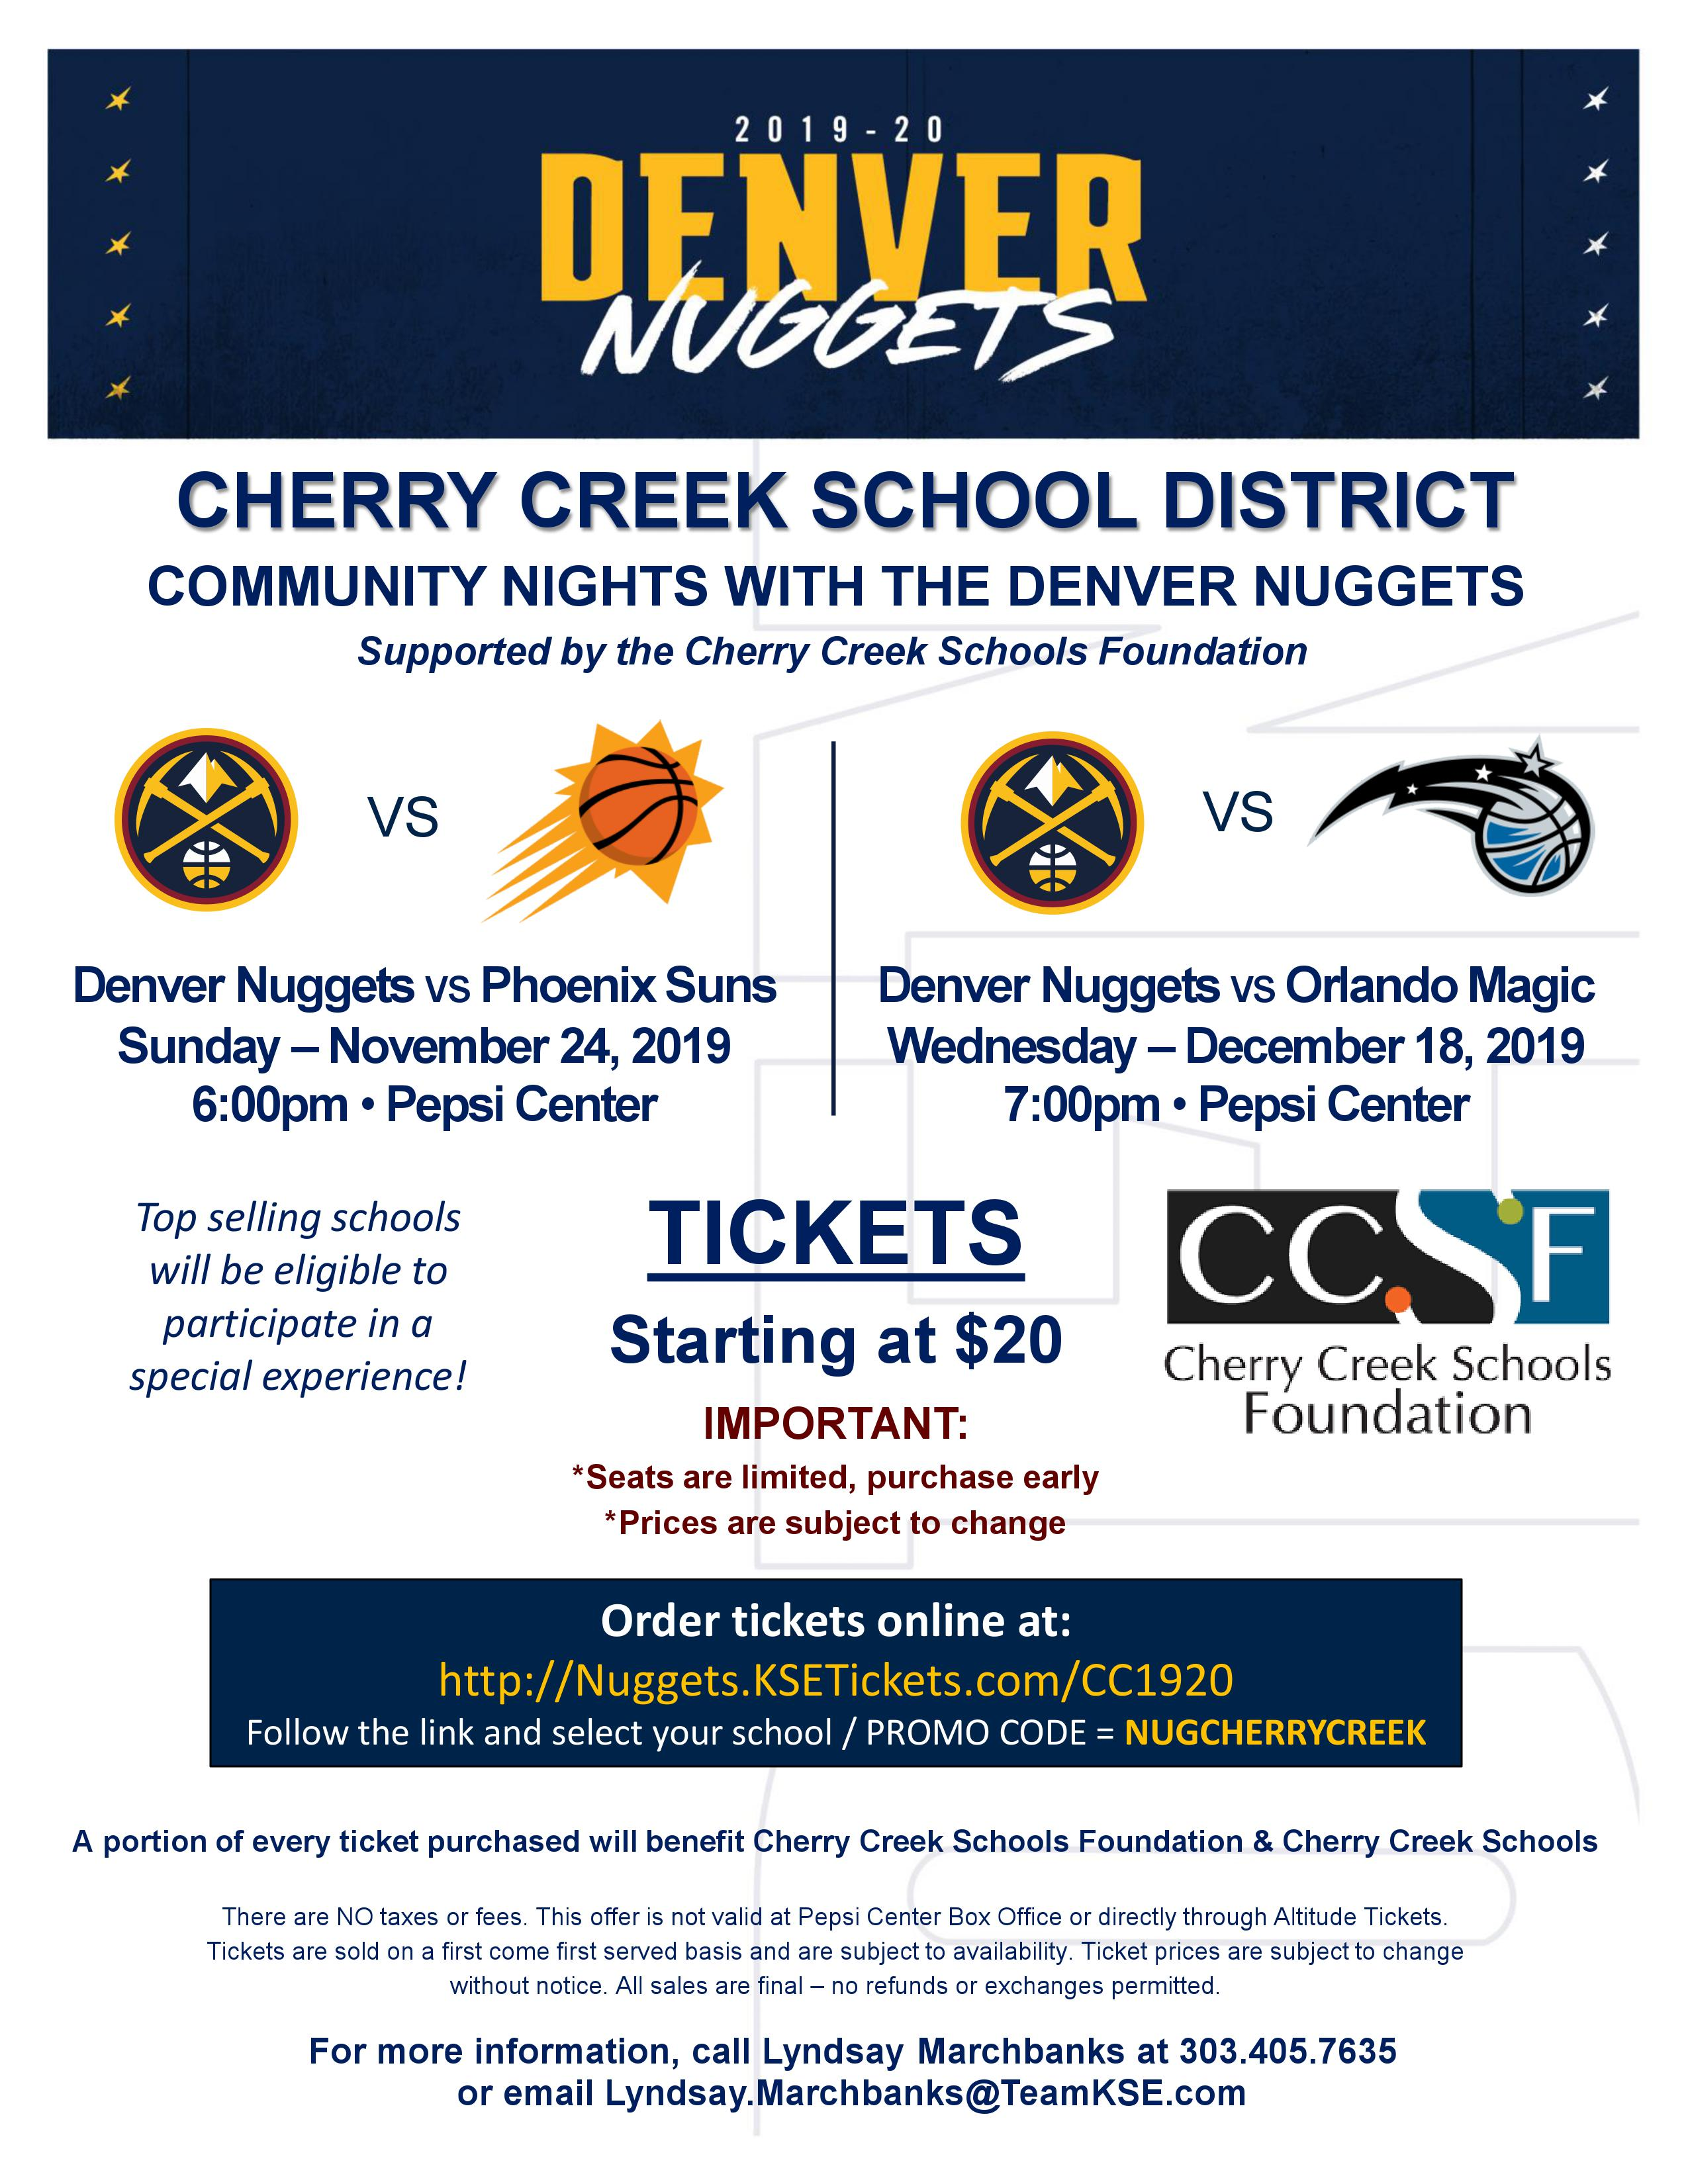 Denver Nuggets Community Nights